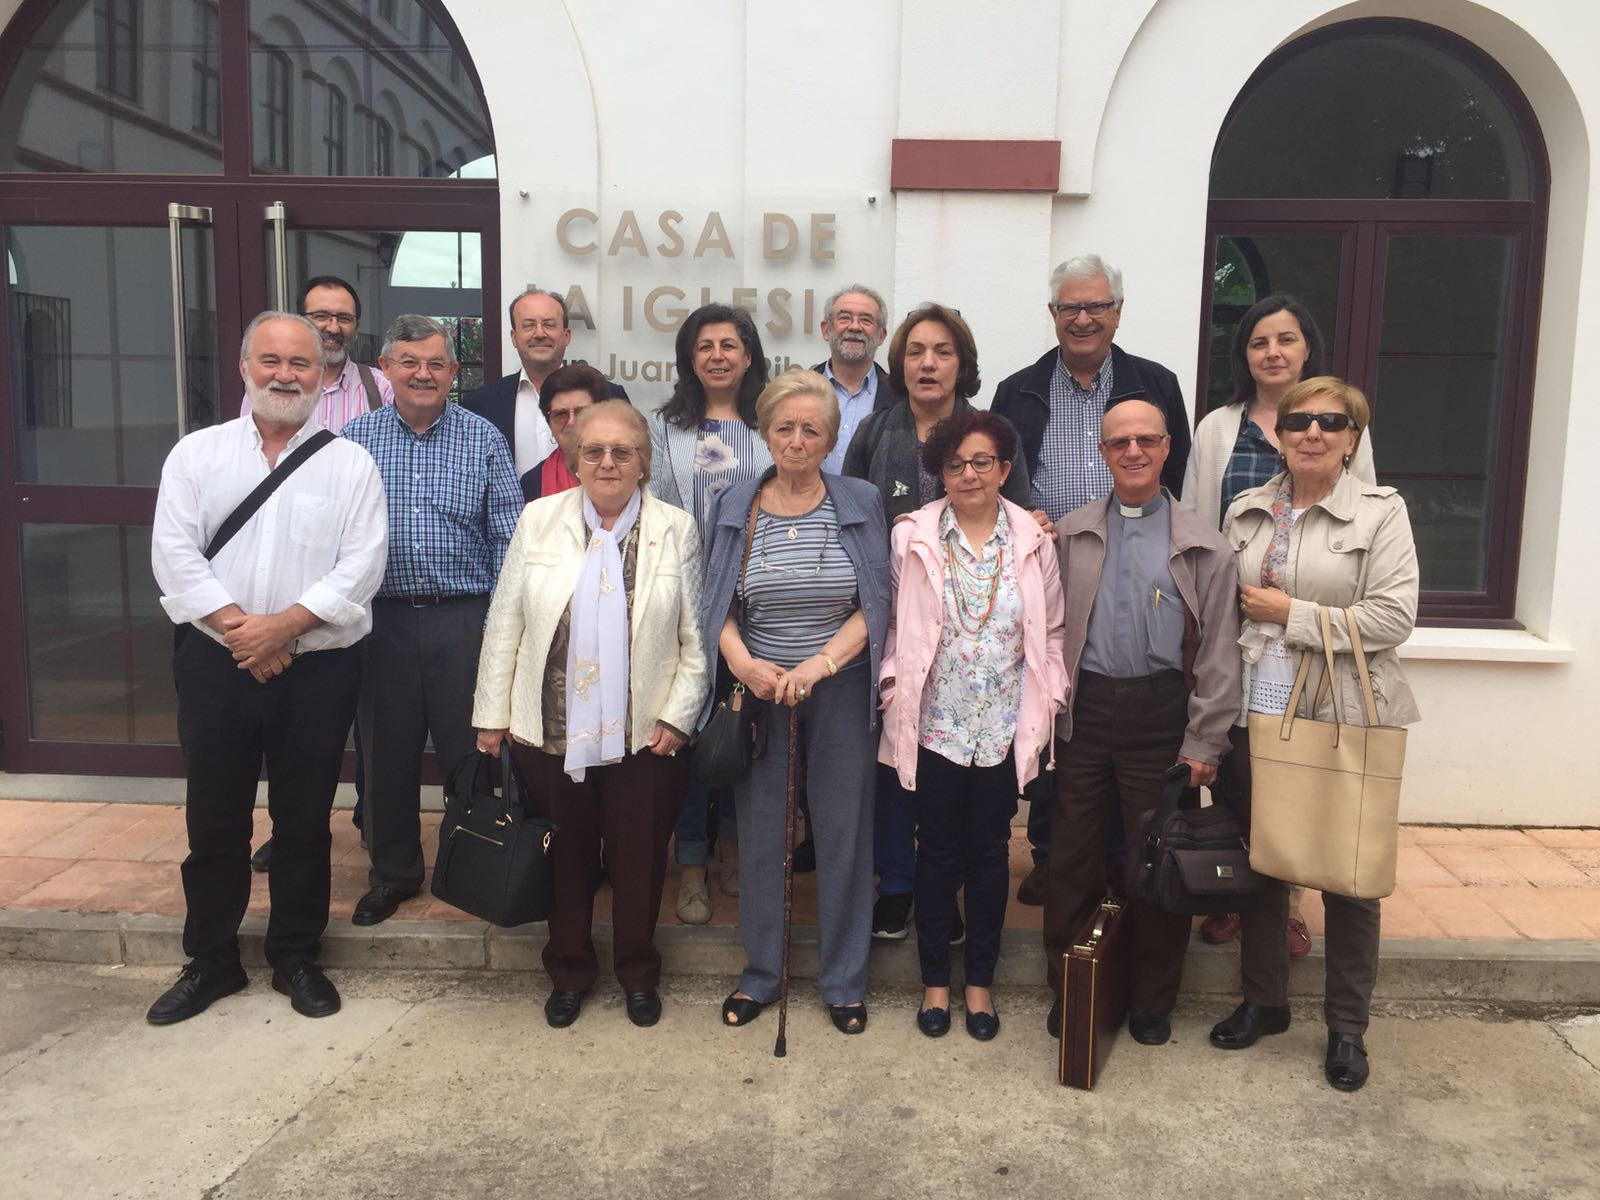 Encuentro del Apostolado Seglar de la Diócesis Mérida-Badajoz